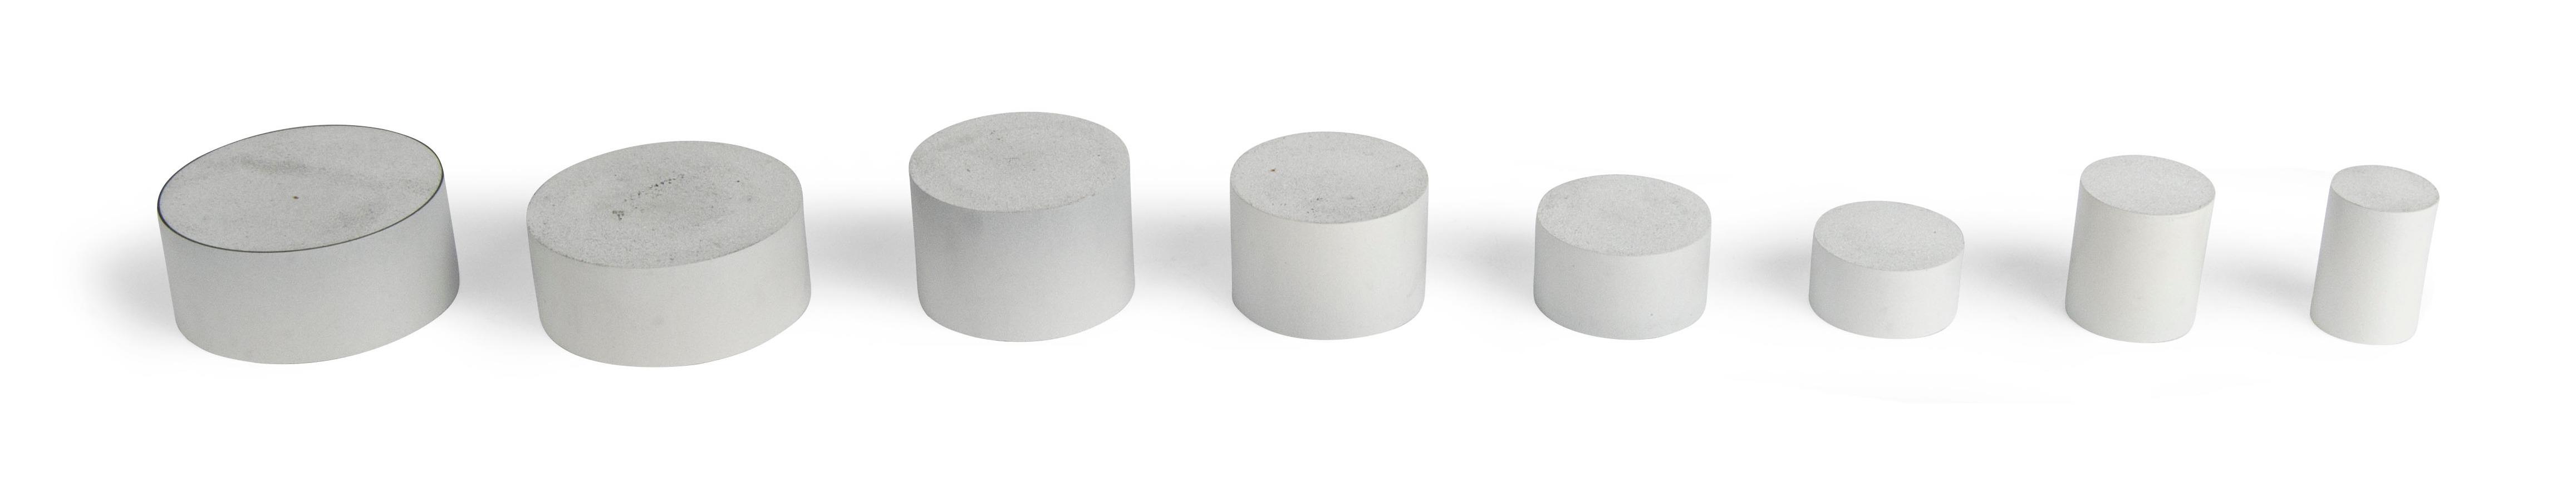 MOV Blocks-1